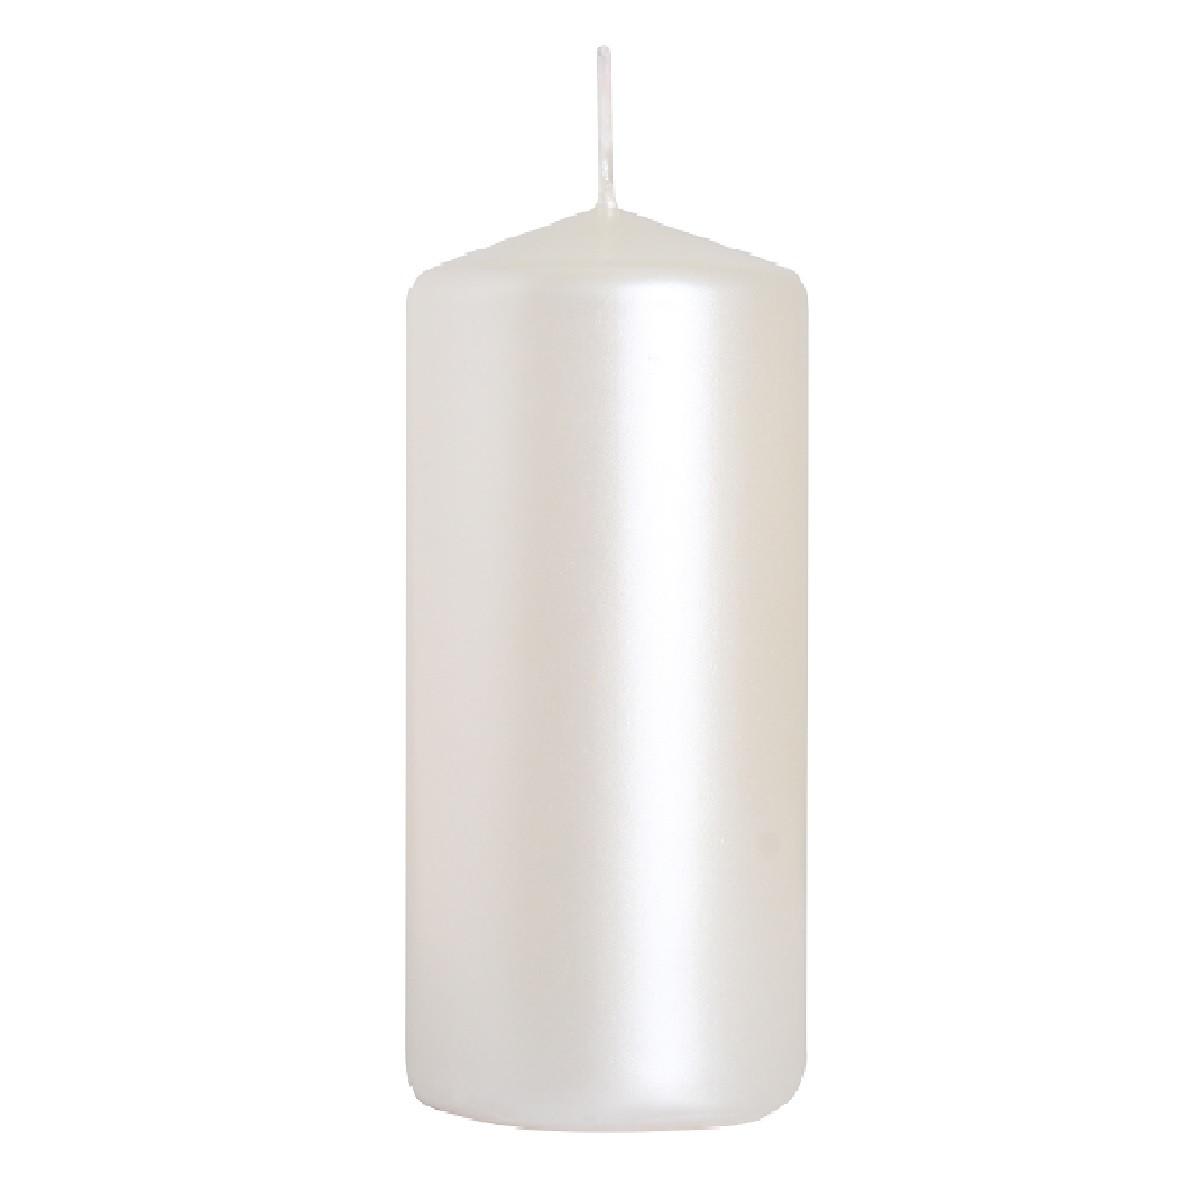 Свеча цилиндр перламутровая Bispol 10 см (sw50/100-190)